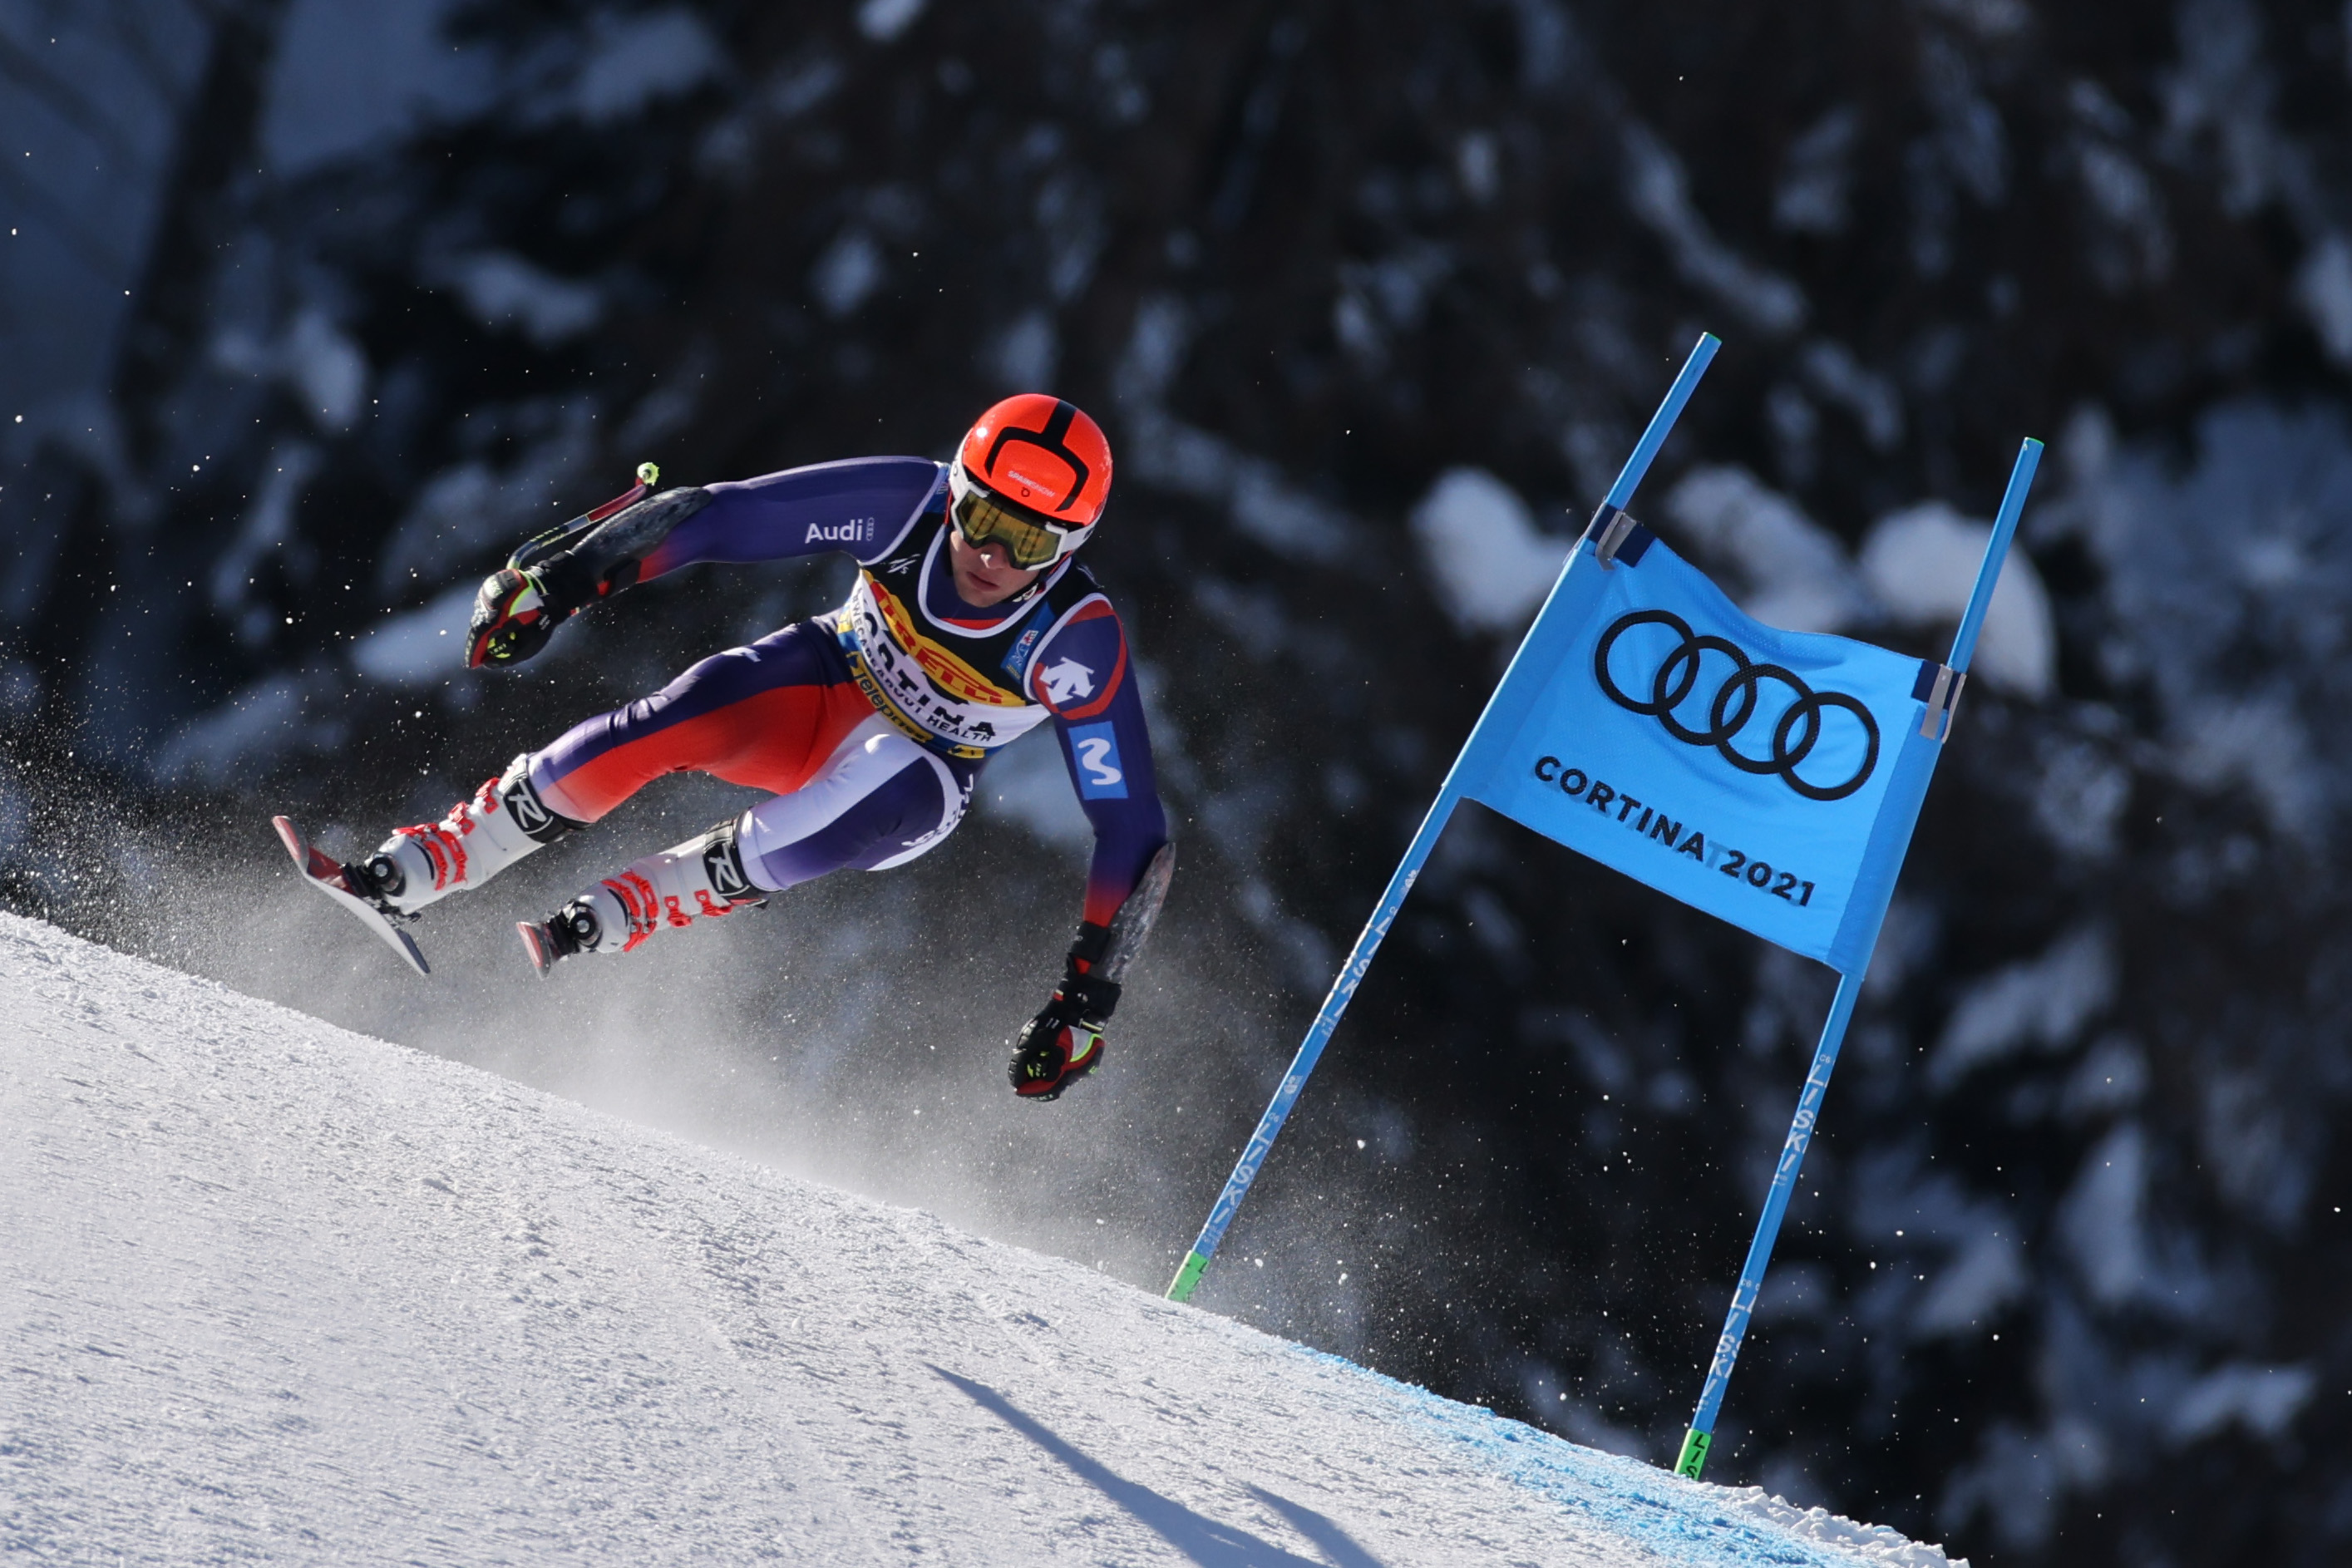 Albert Ortega en el SG de Cortina 2021 - Foto: RFEDI (Pentaphoto Marco Trovati)